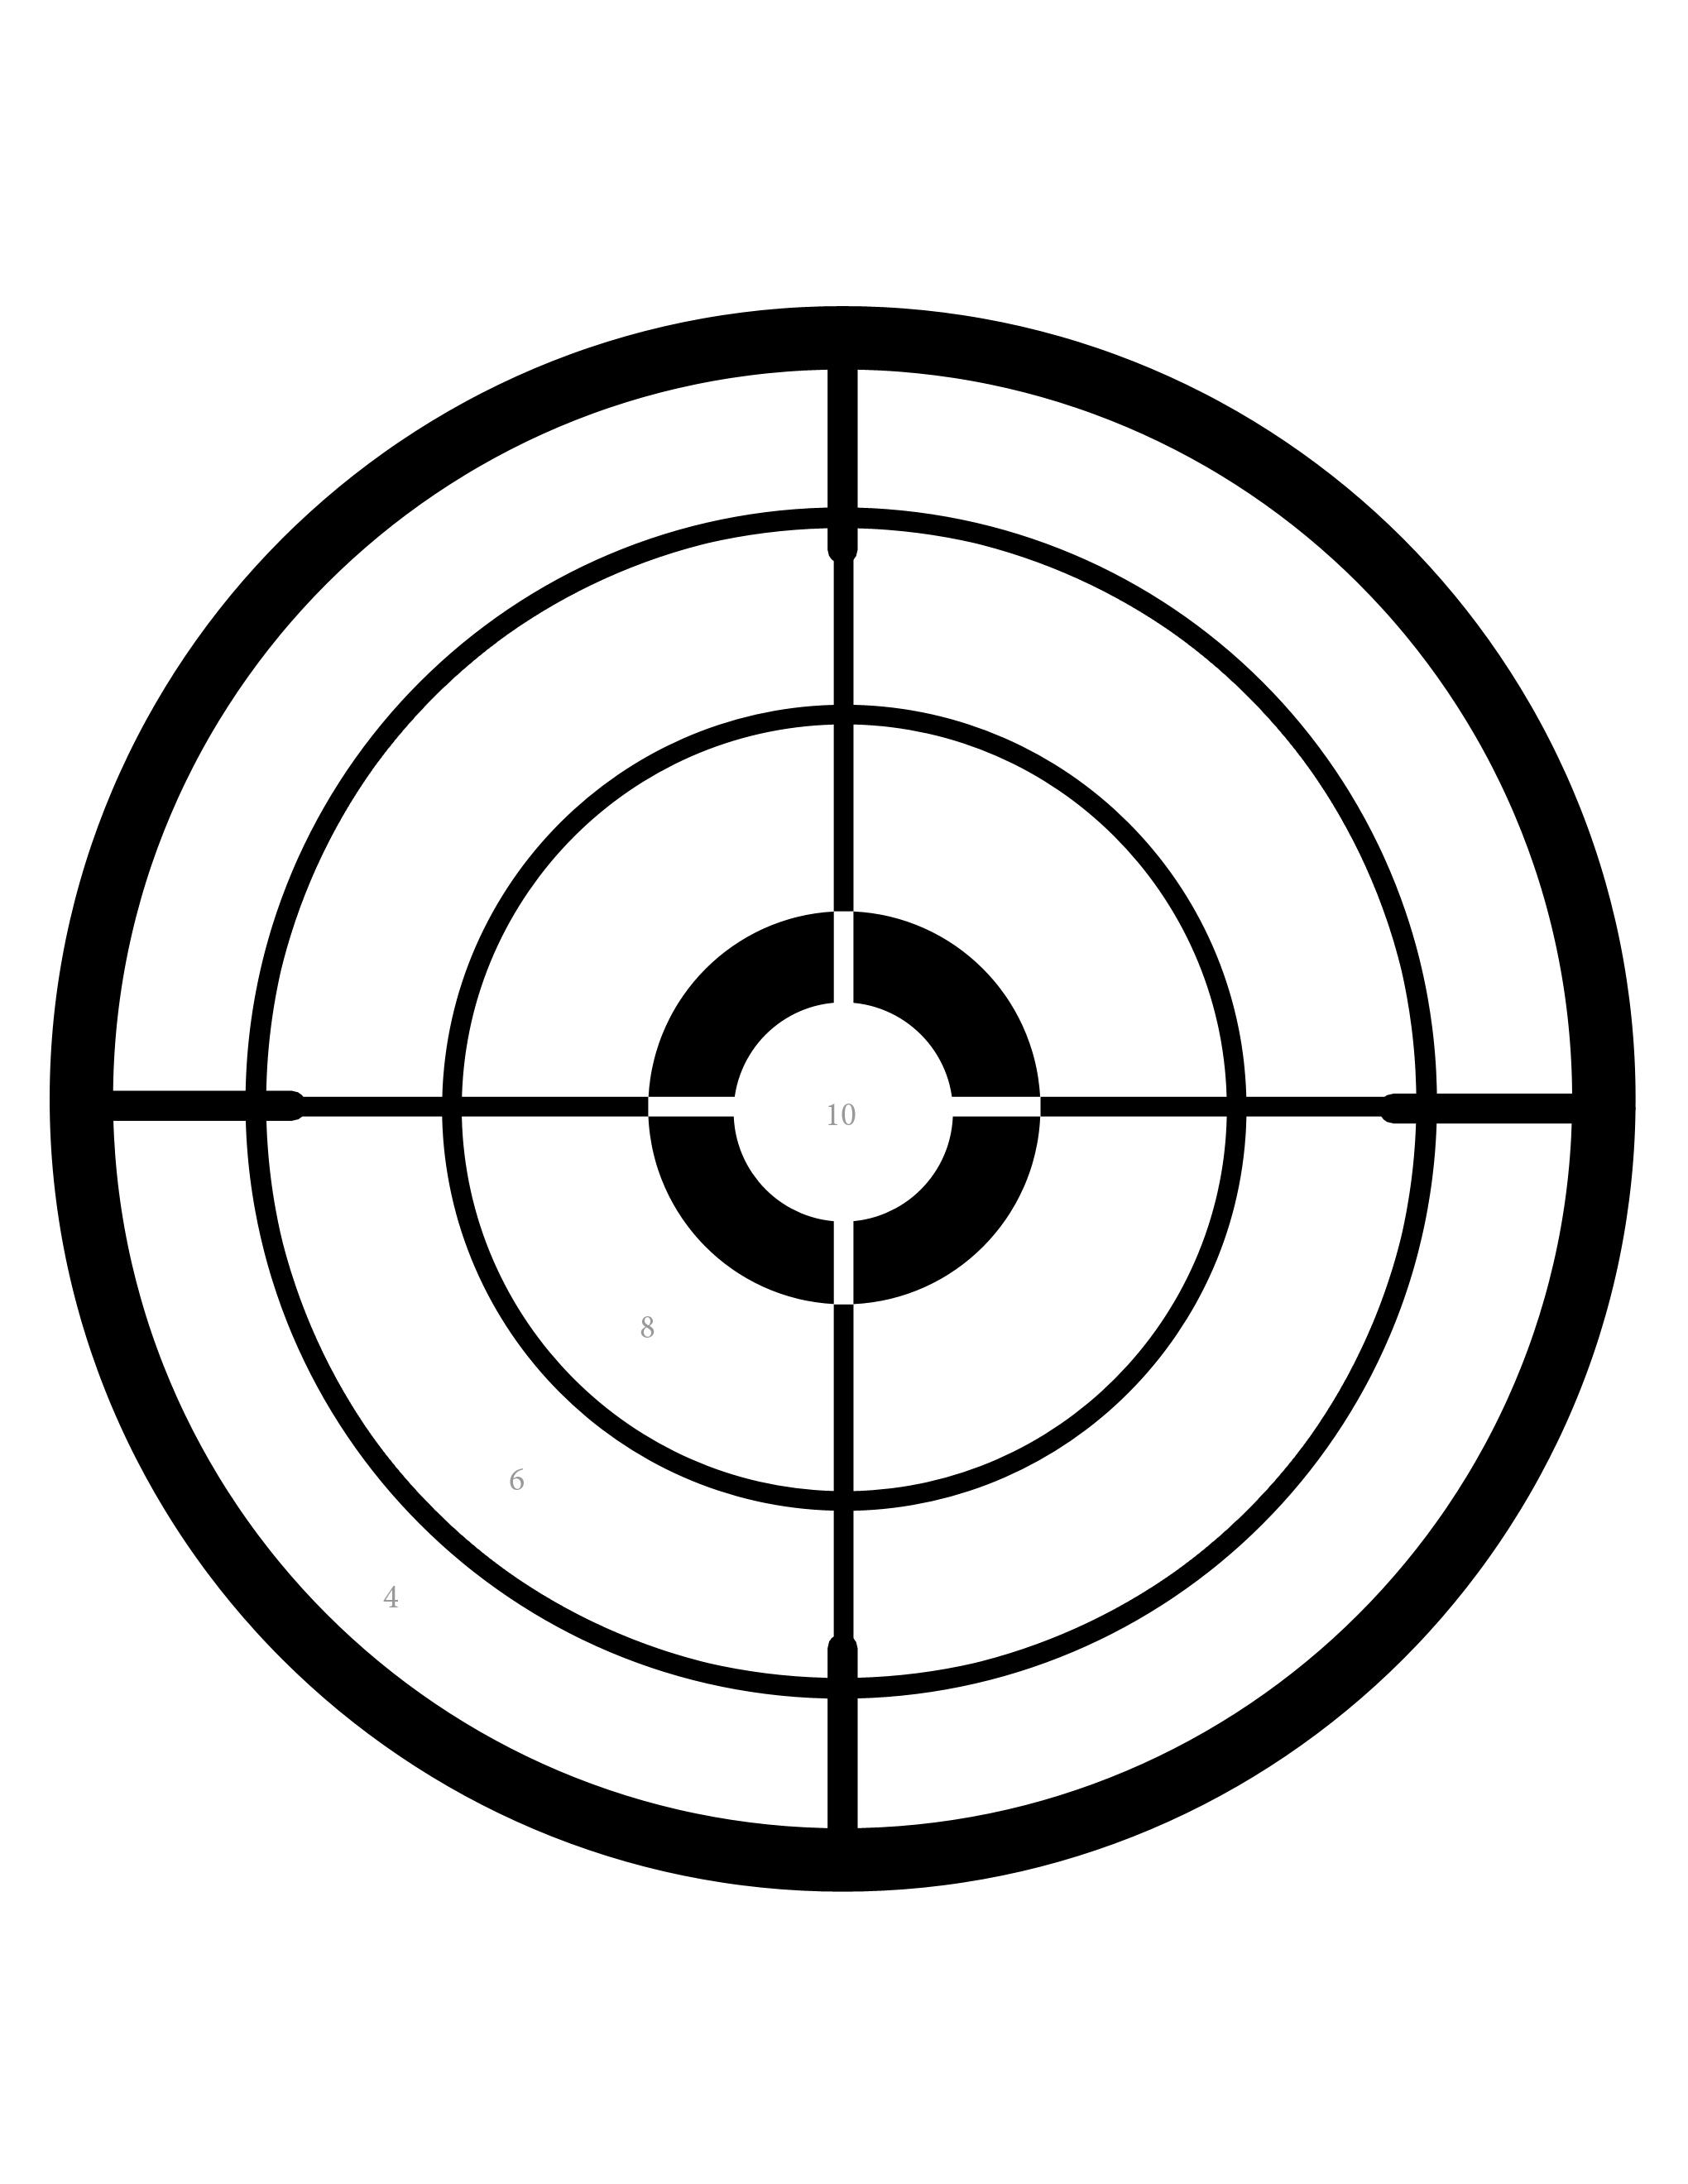 Fun Free Printable Targets